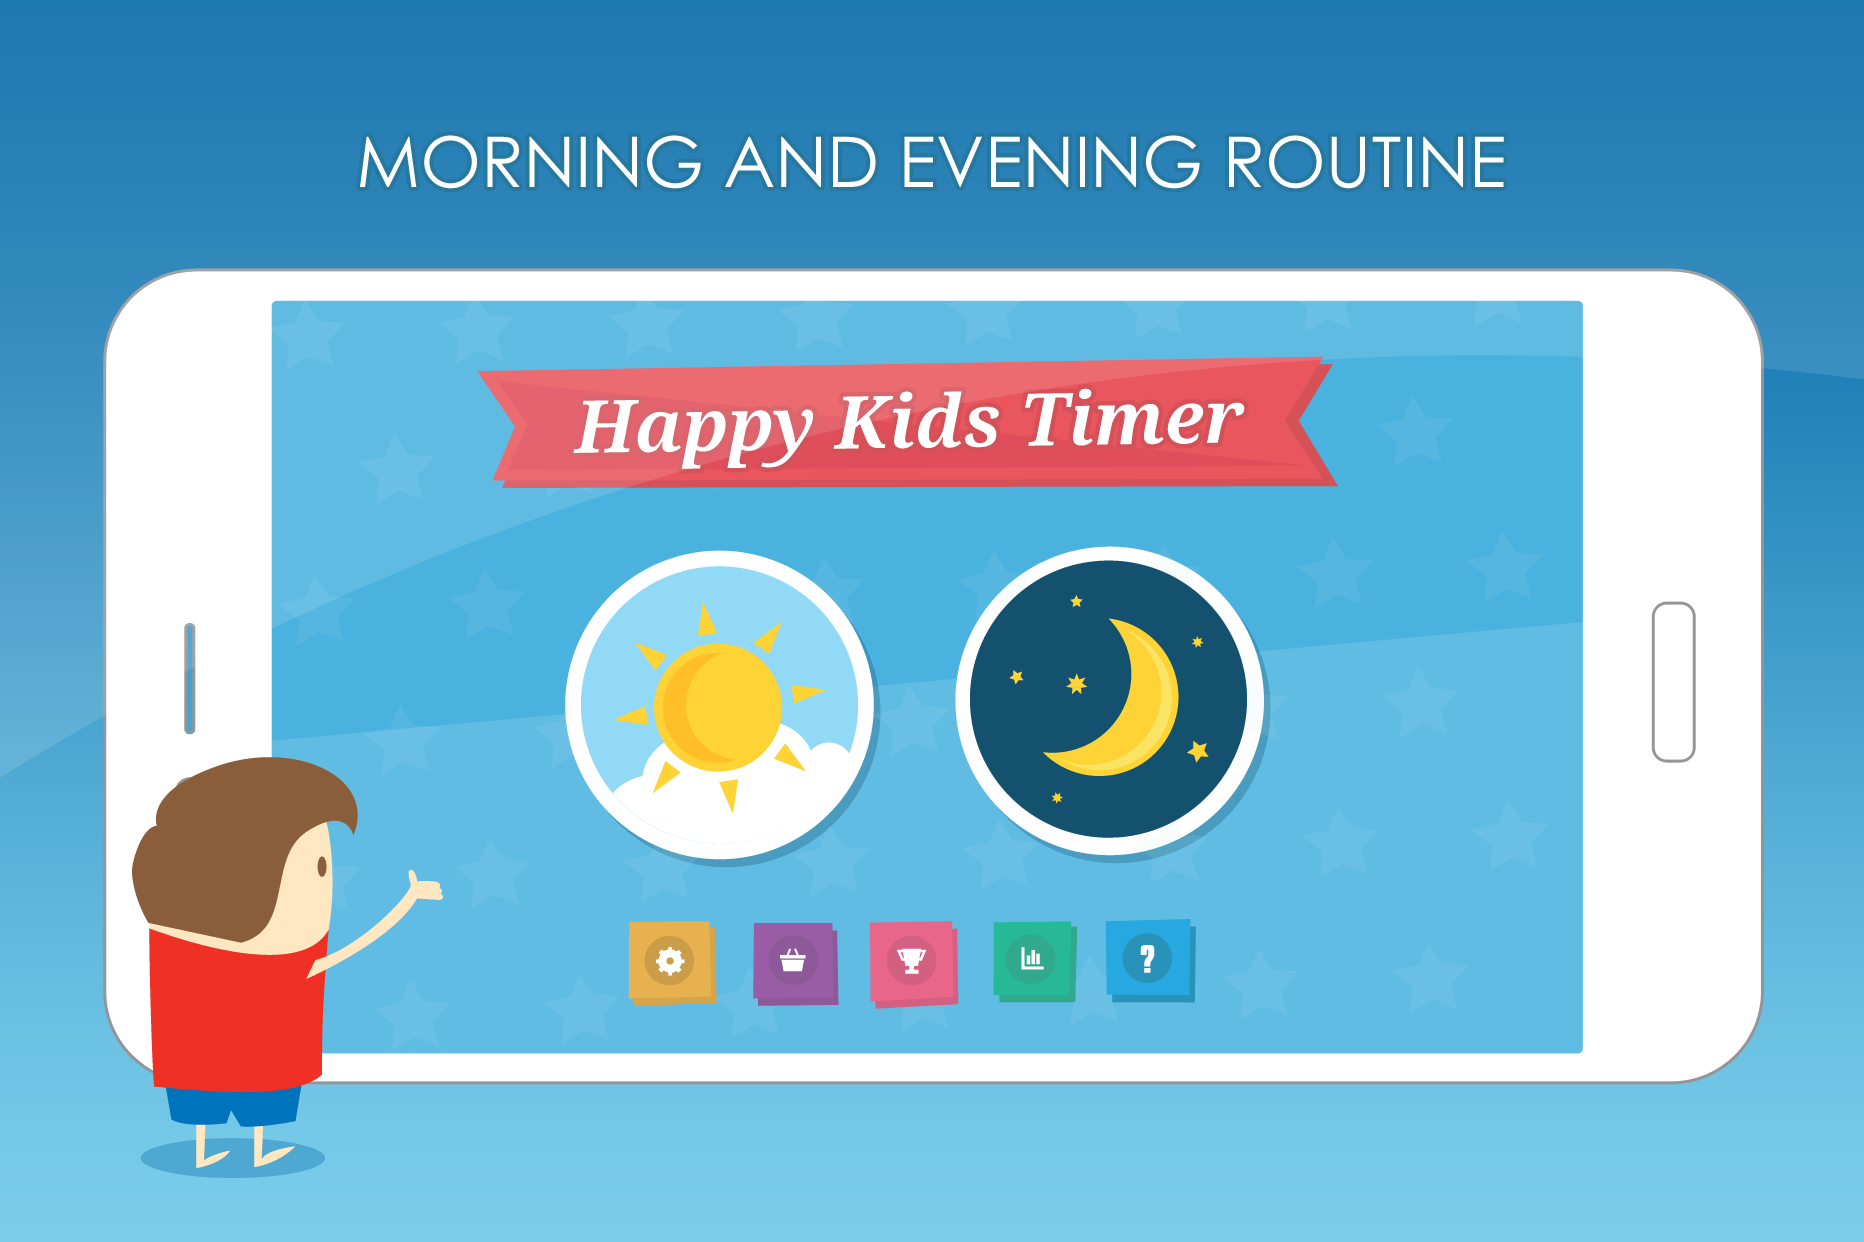 Happy Kids Timer